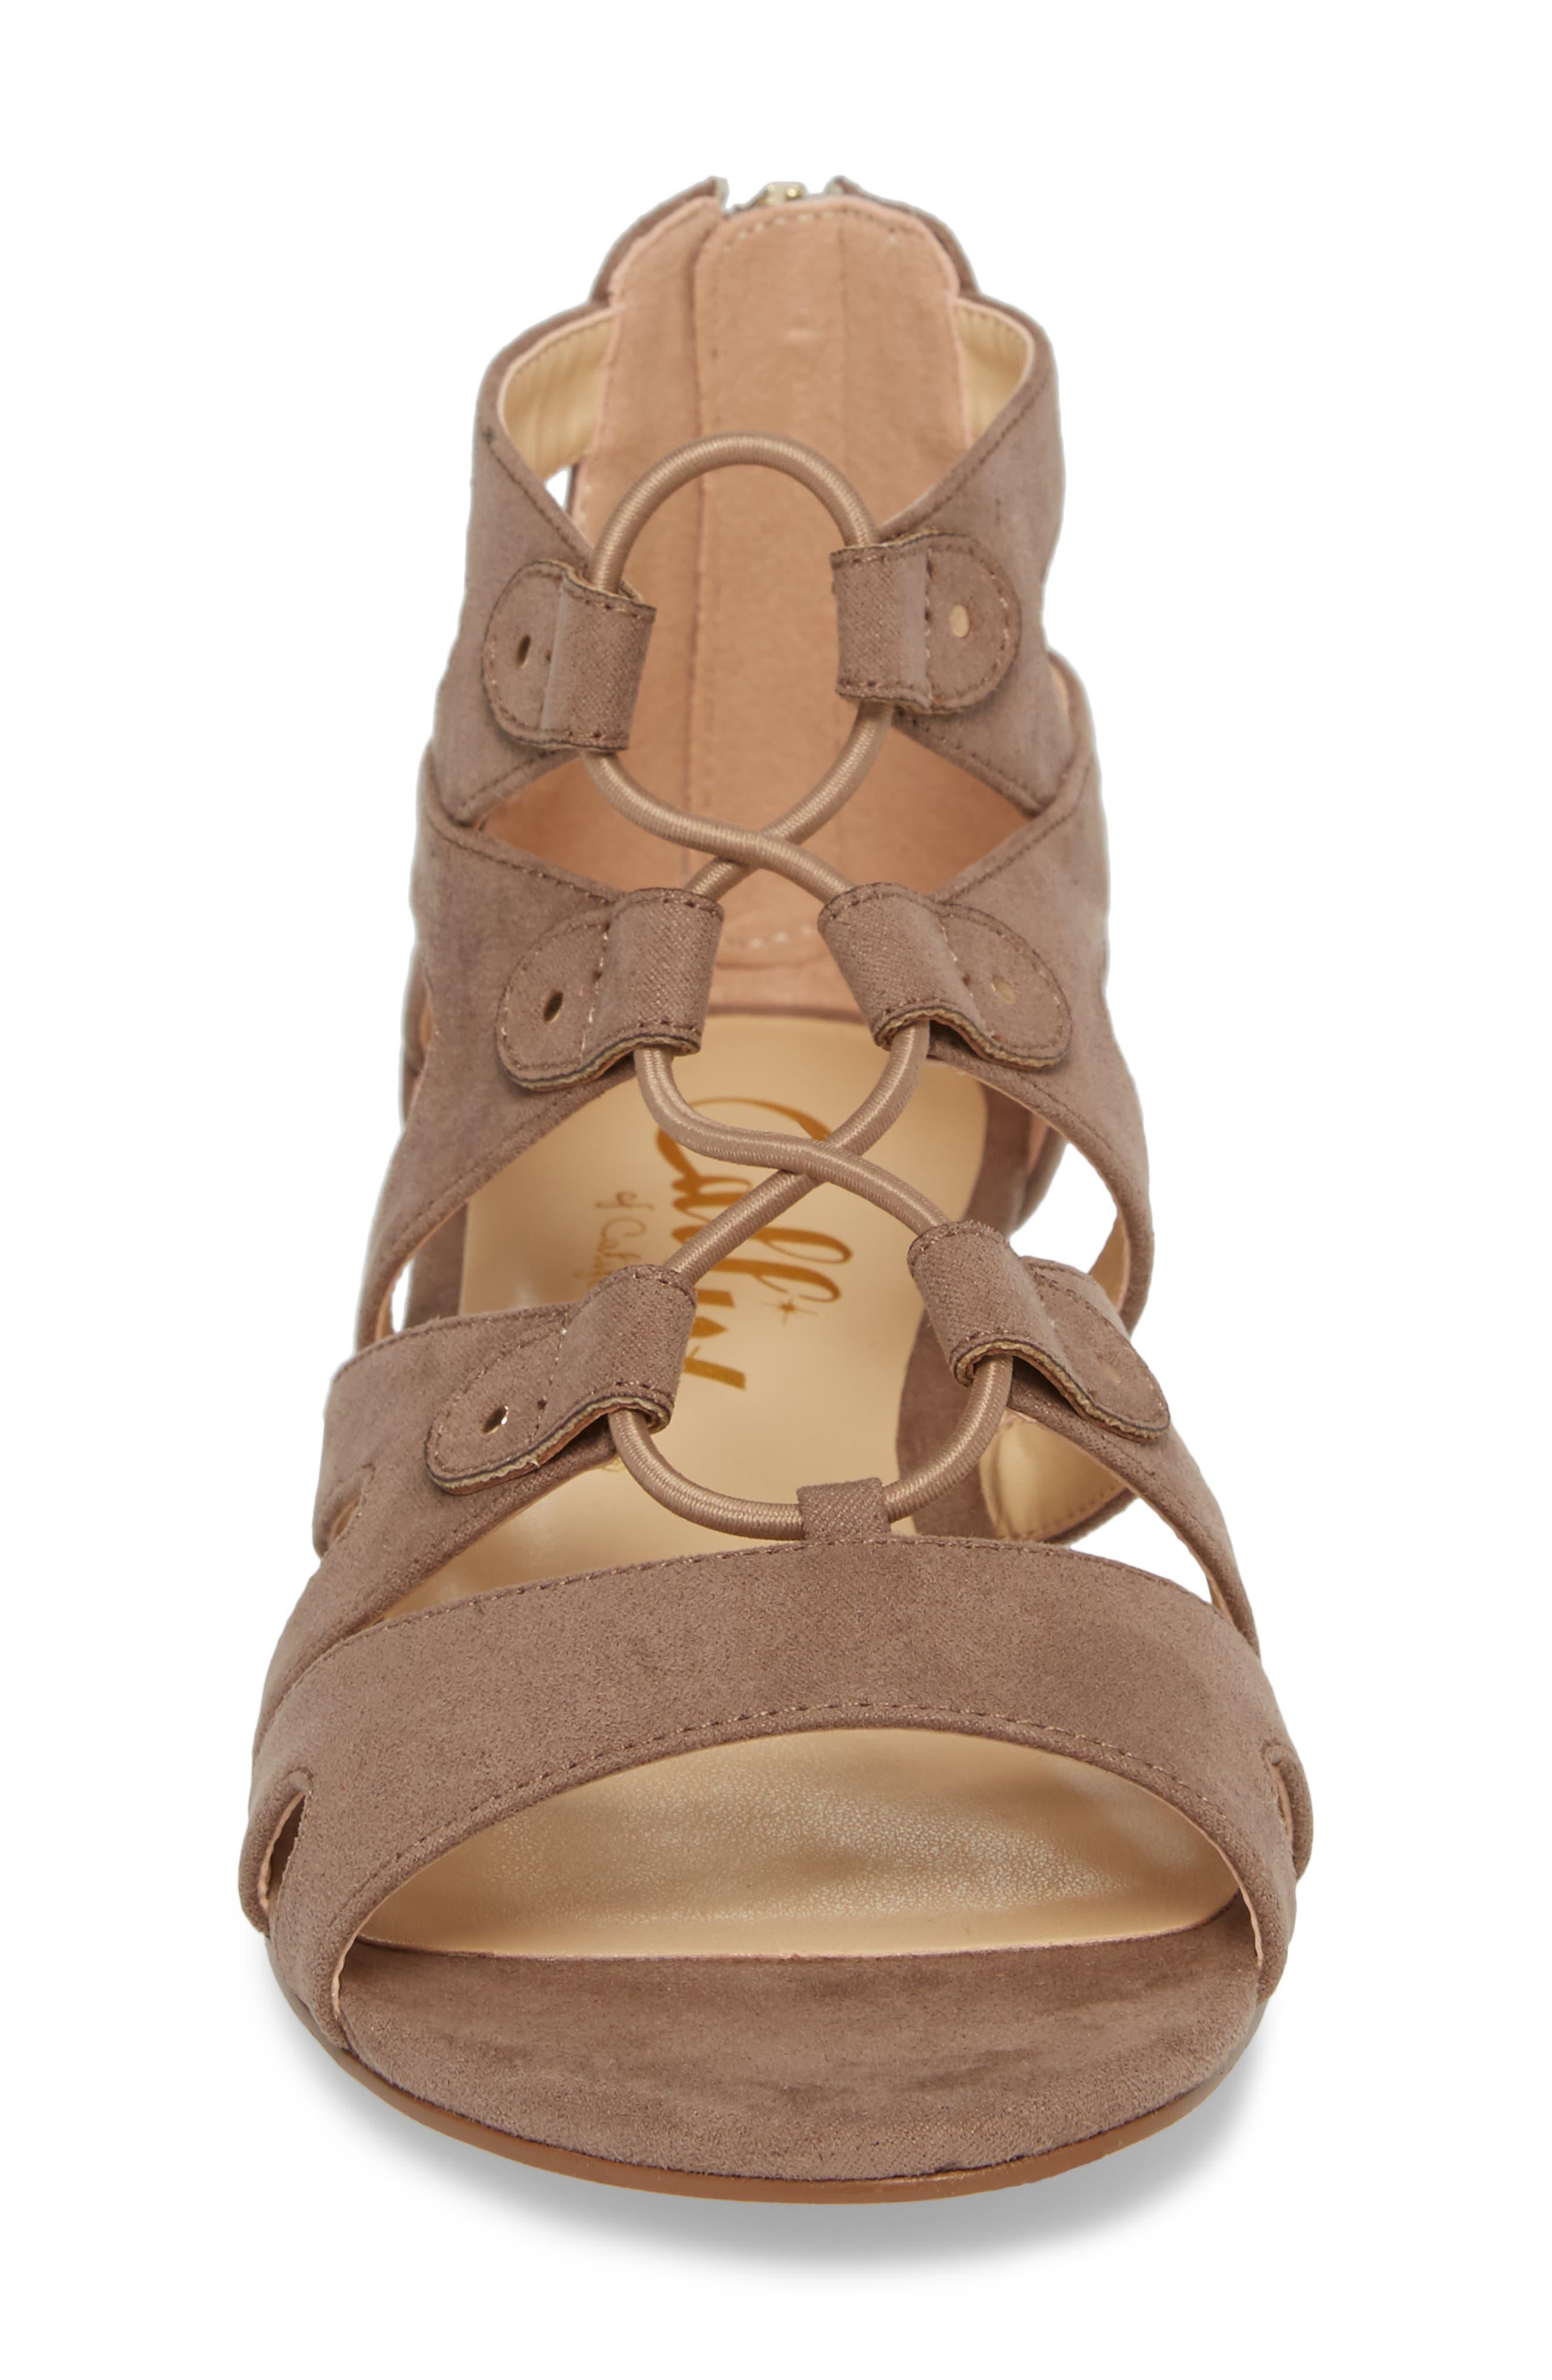 Lexx Lace-Up Sandal,                             Alternate thumbnail 4, color,                             Taupe Suede